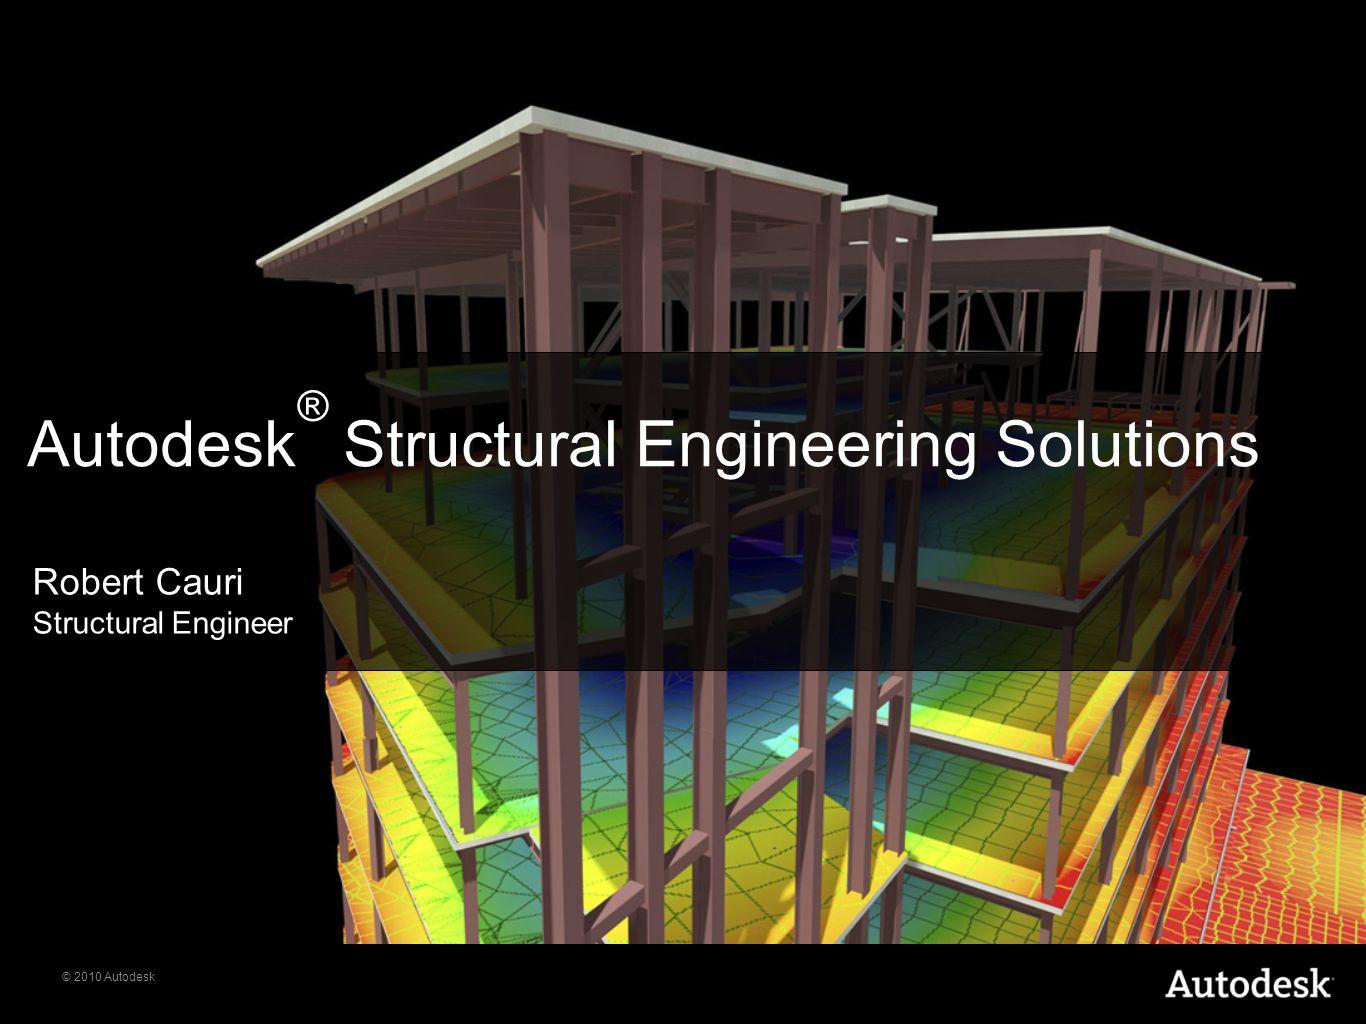 © 2010 Autodesk Autodesk ® Structural Engineering Solutions Robert Cauri Structural Engineer